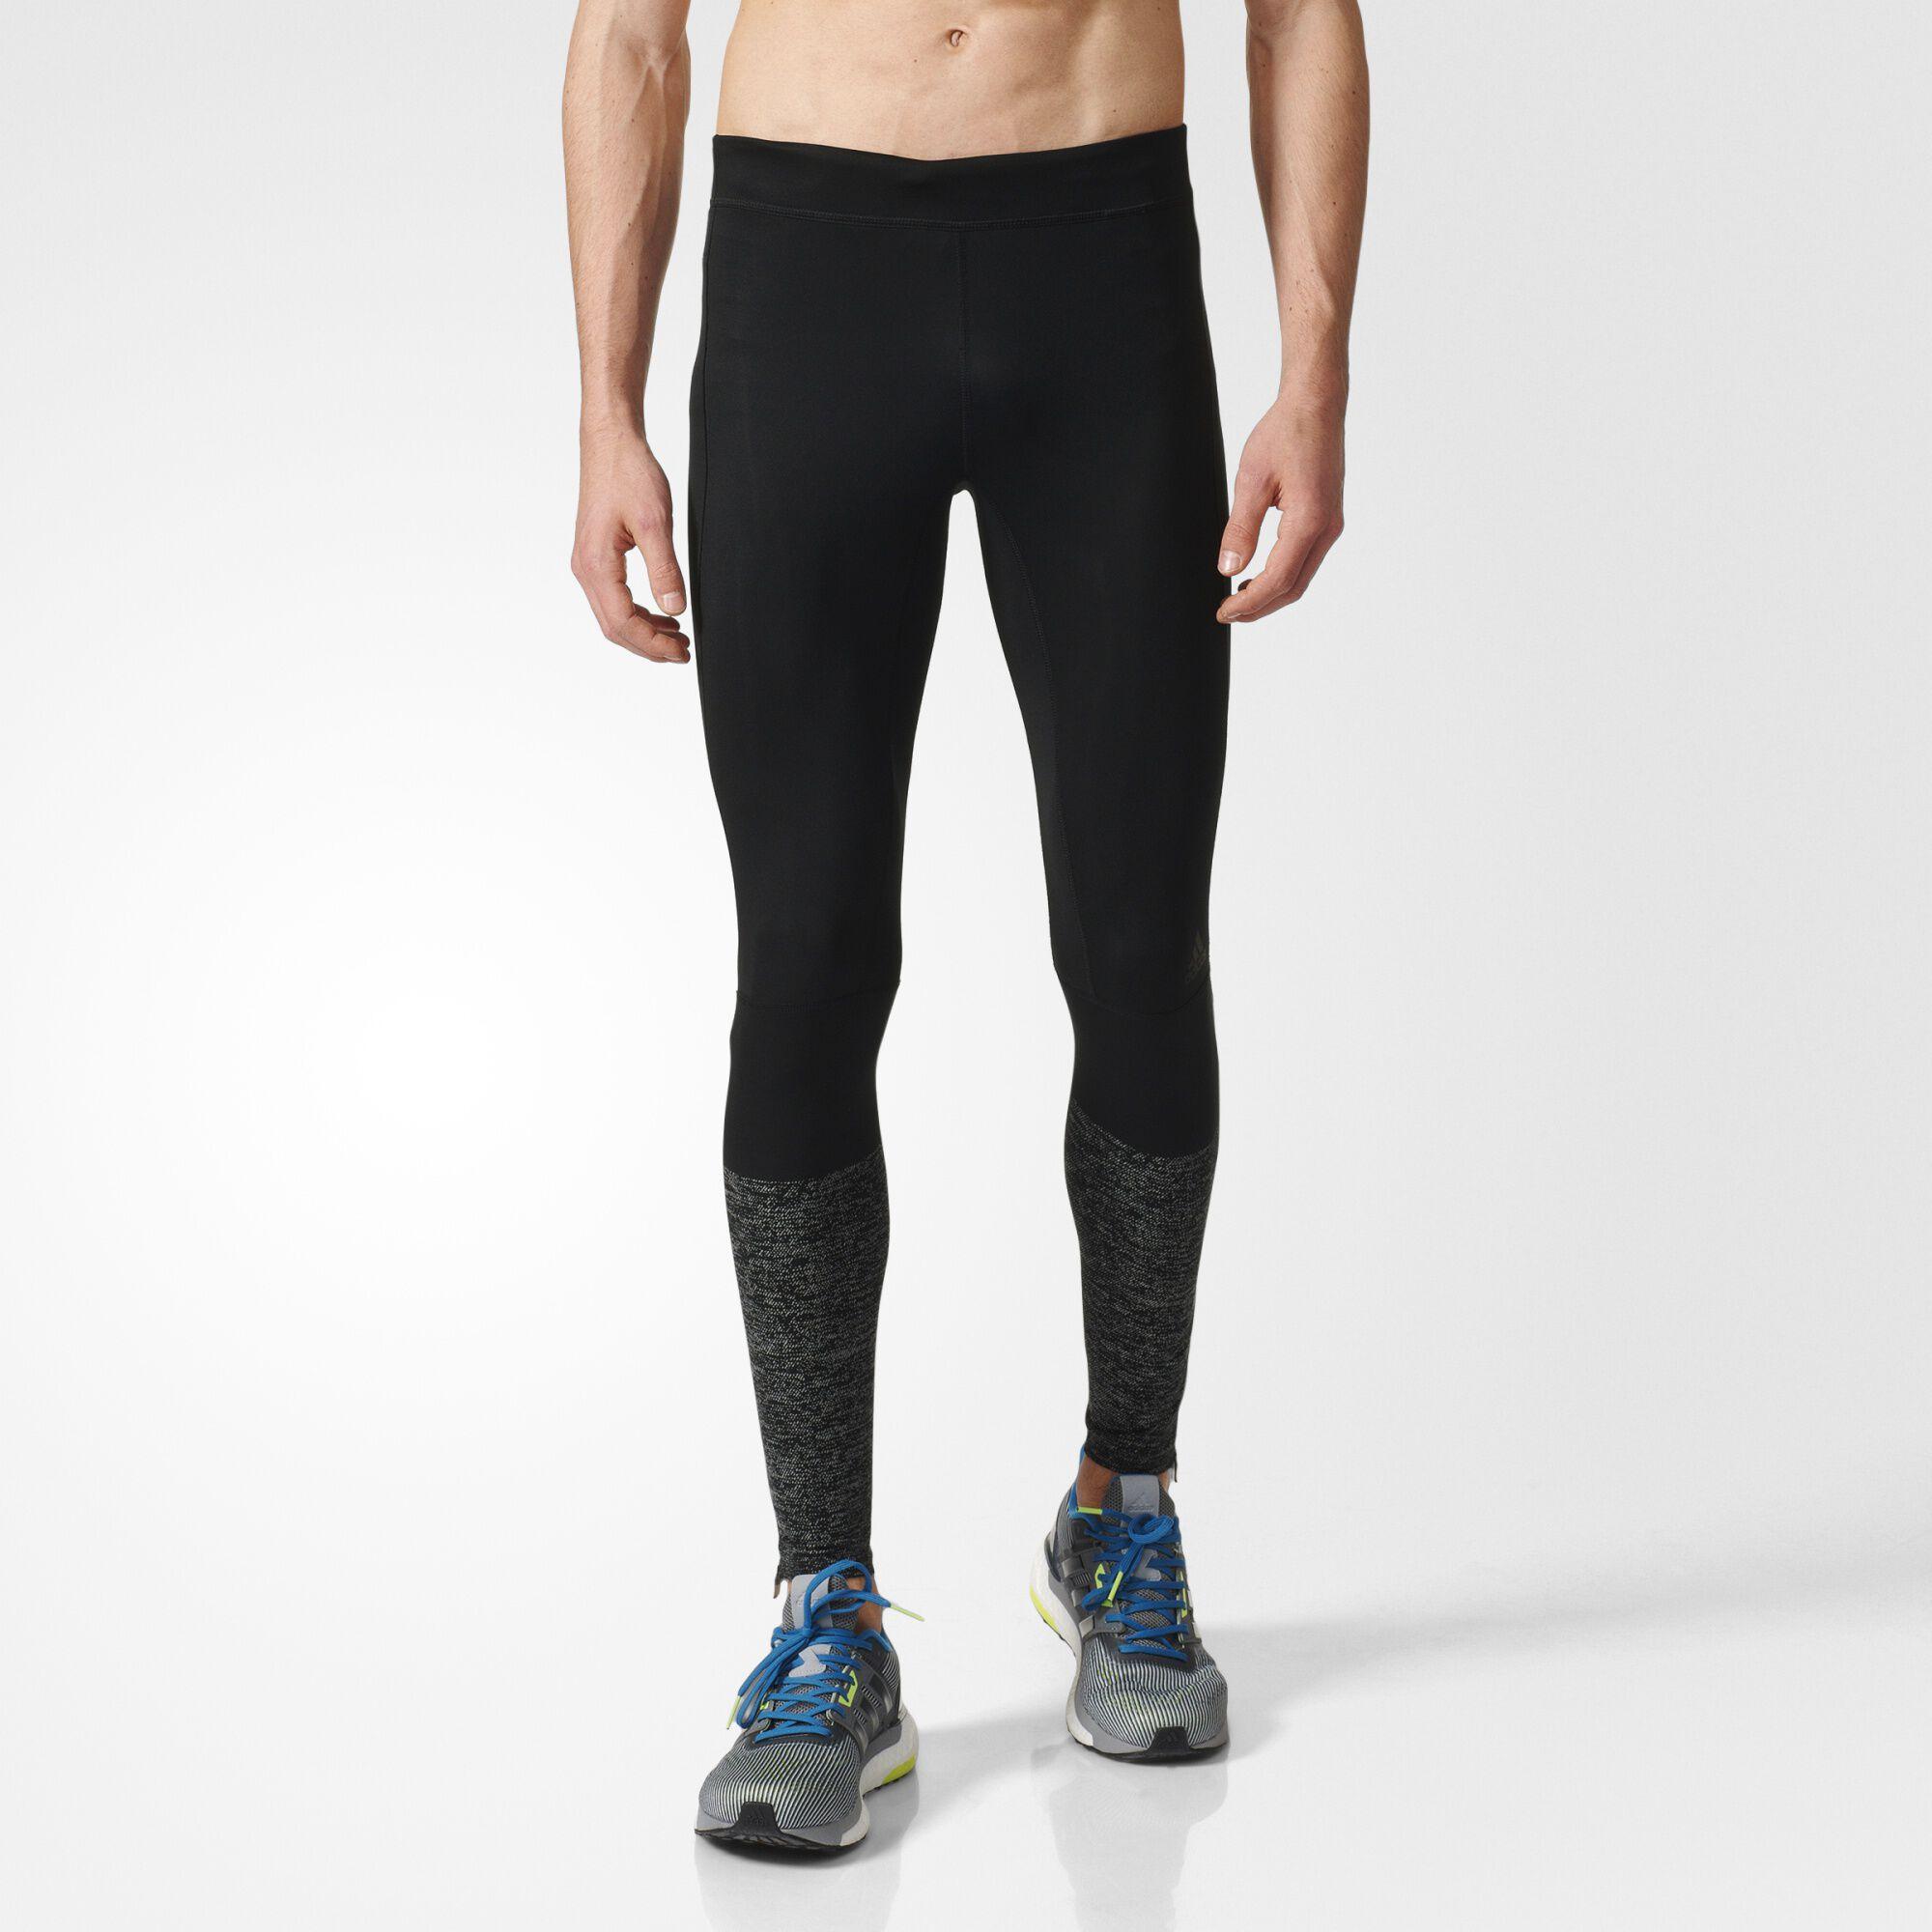 adidas bball leggings